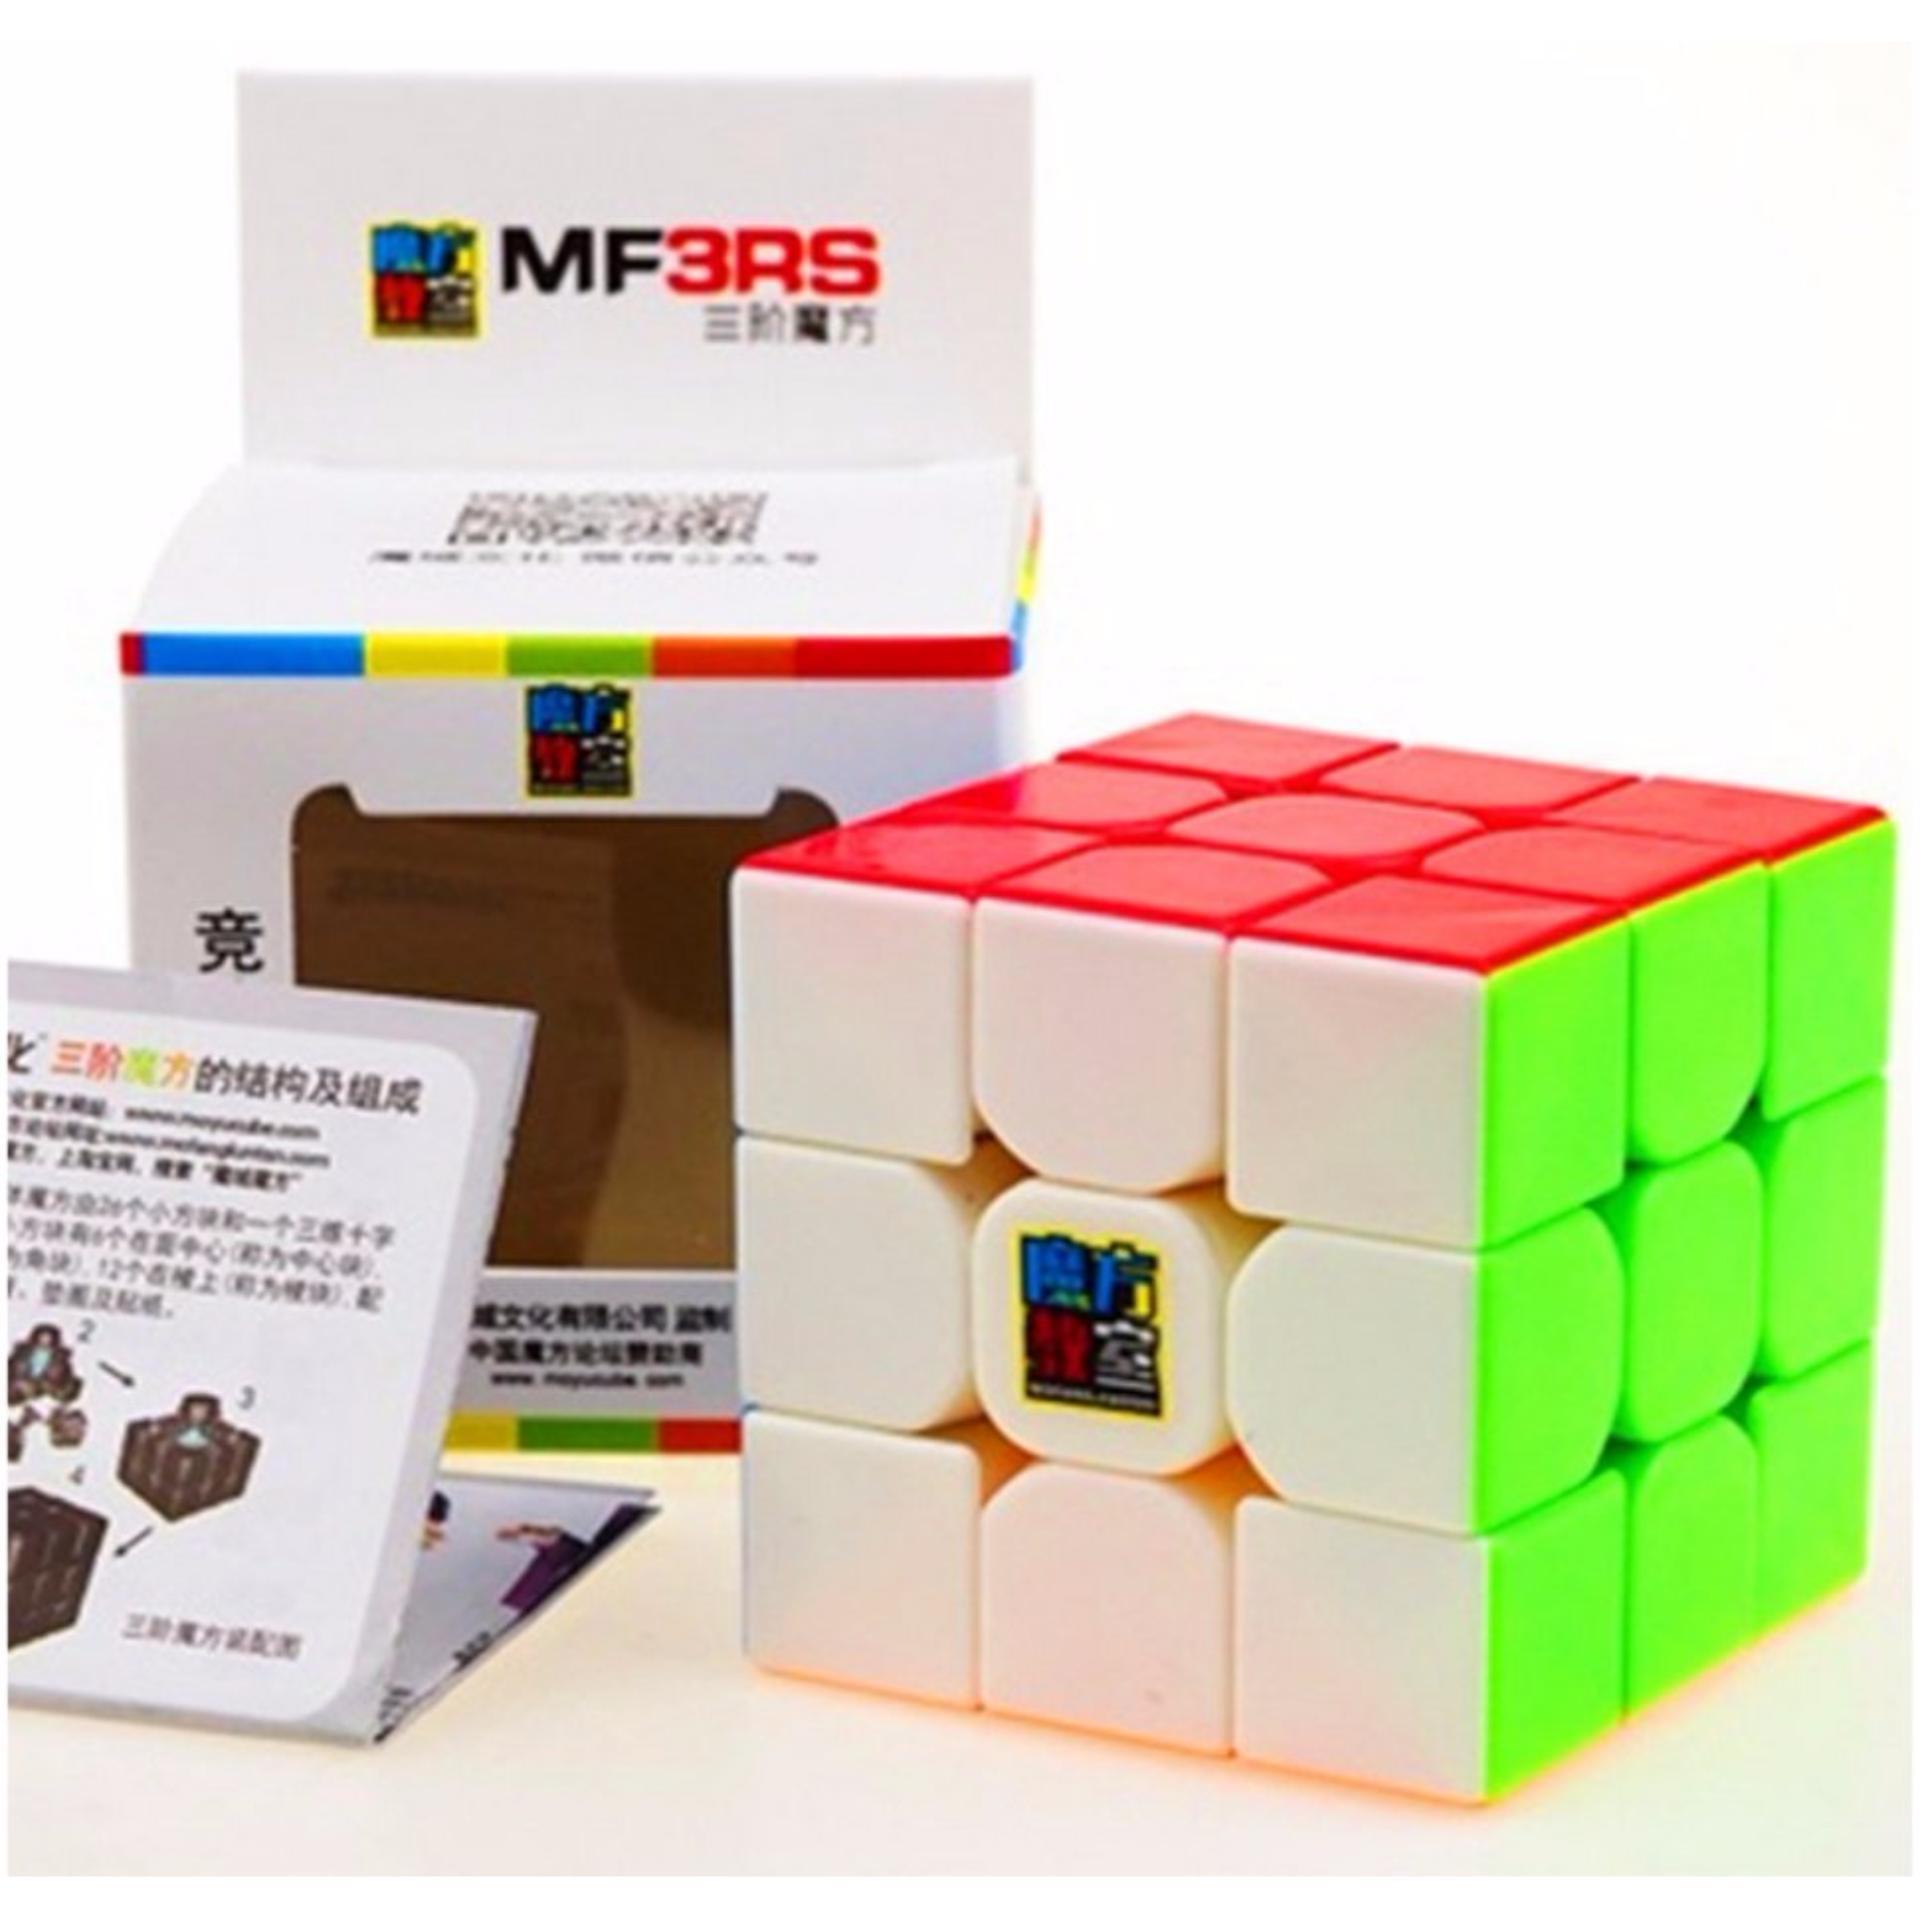 MoYu MoFangJiaoShi 3×3 MF3RS Stickerless